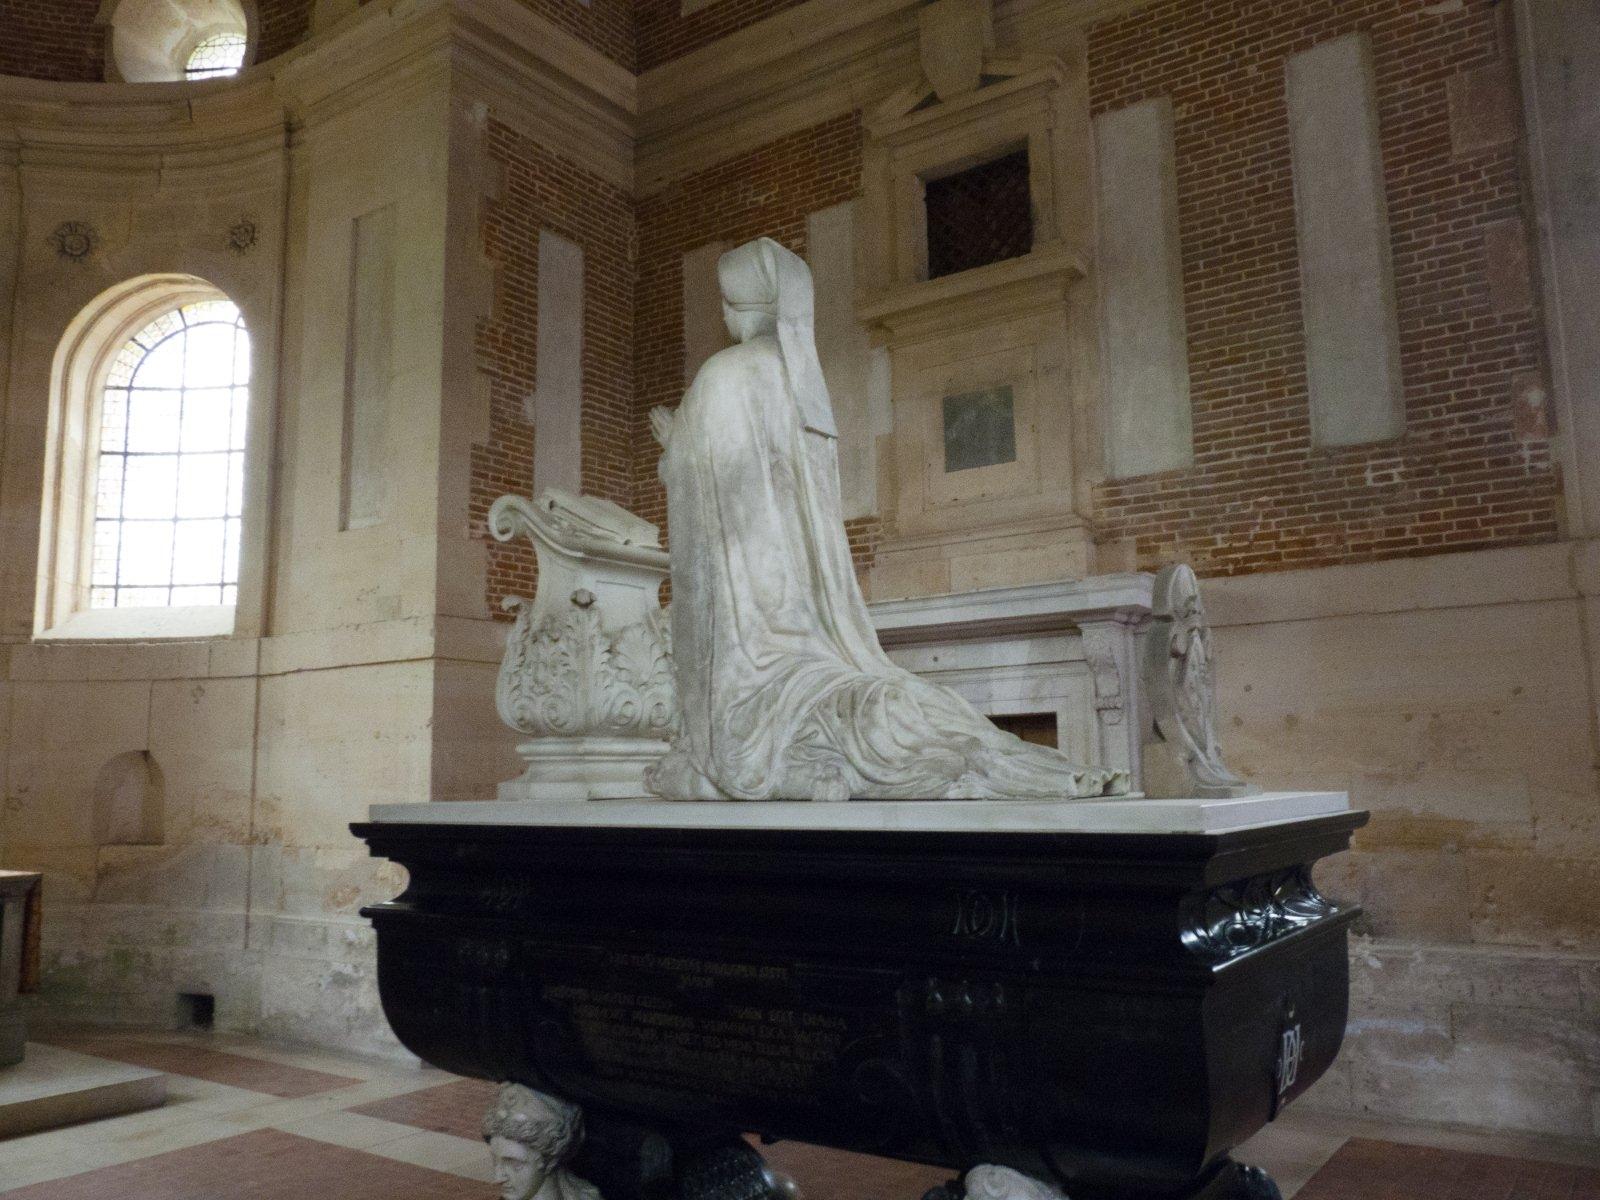 1566 - Chateau d'Anet - tomb of Diane de Poitiers